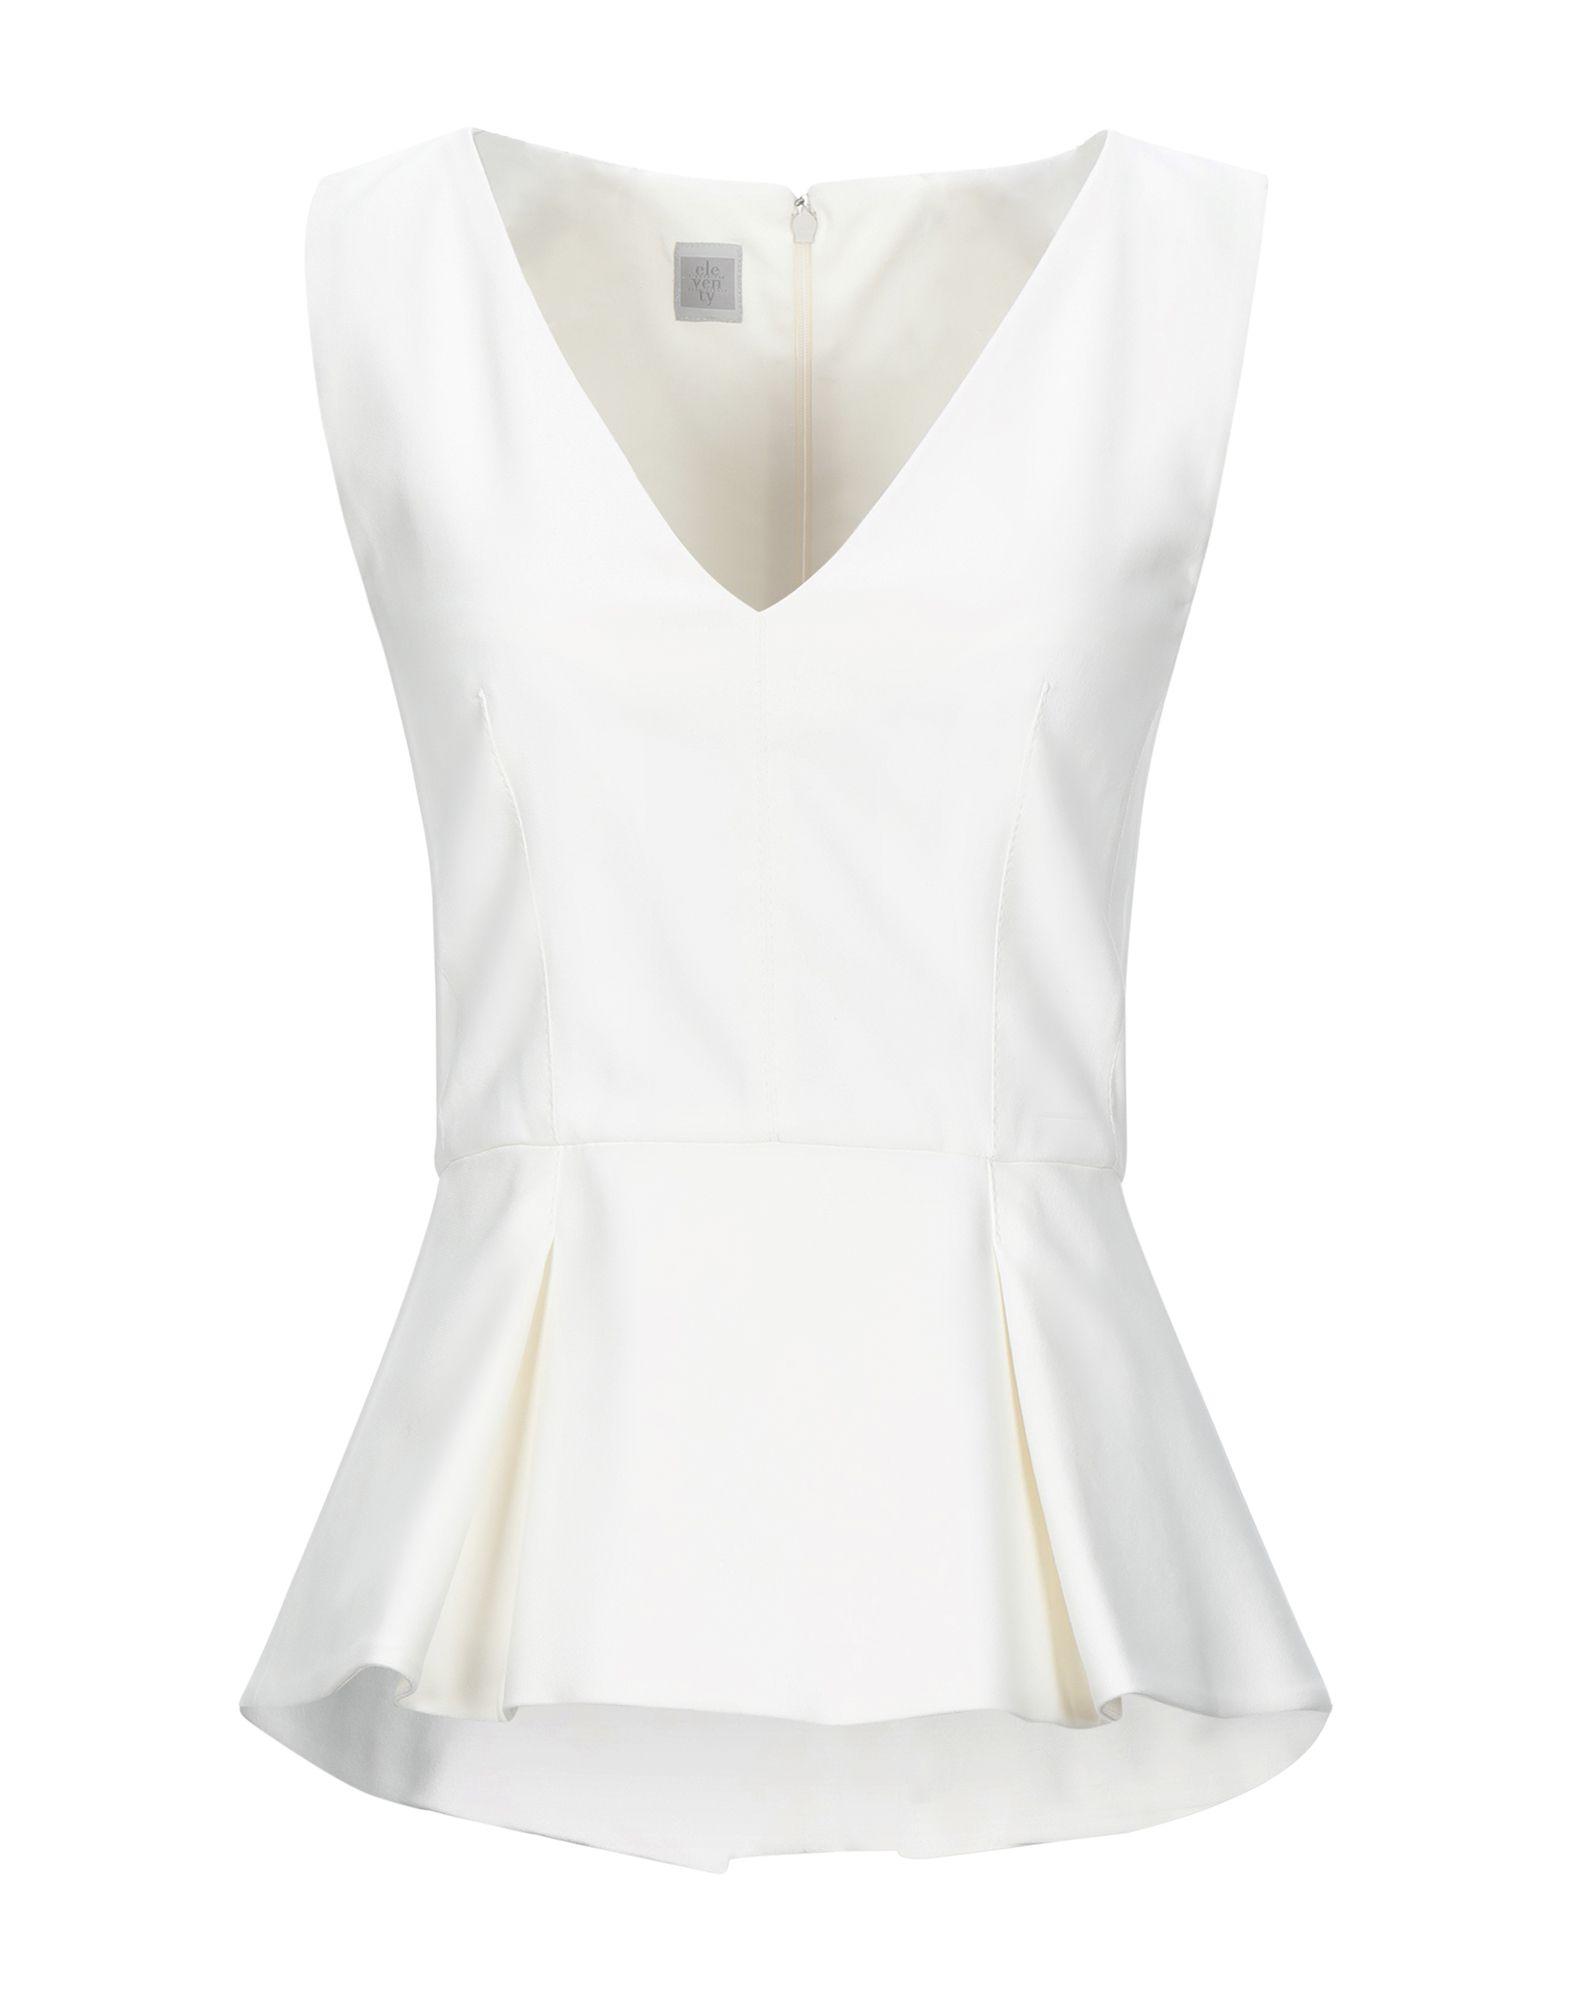 ELEVENTY Tops. plain weave, no appliqués, solid color, v-neck, sleeveless, rear closure, zipper closure, no pockets, stretch. 50% Cotton, 48% Viscose, 2% Elastane